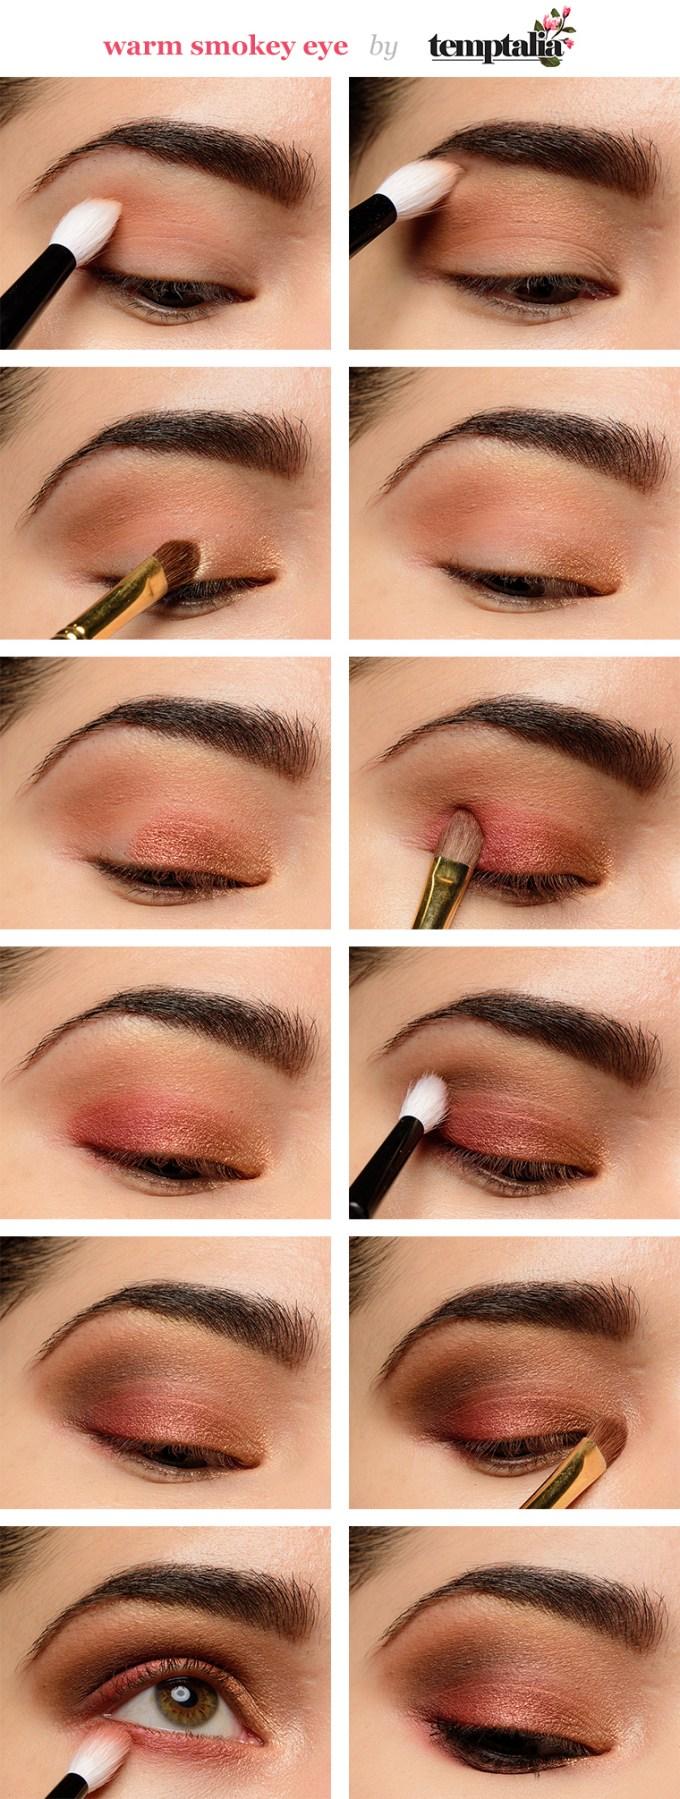 eye makeup for beginners: step-by-step tutorial (2019